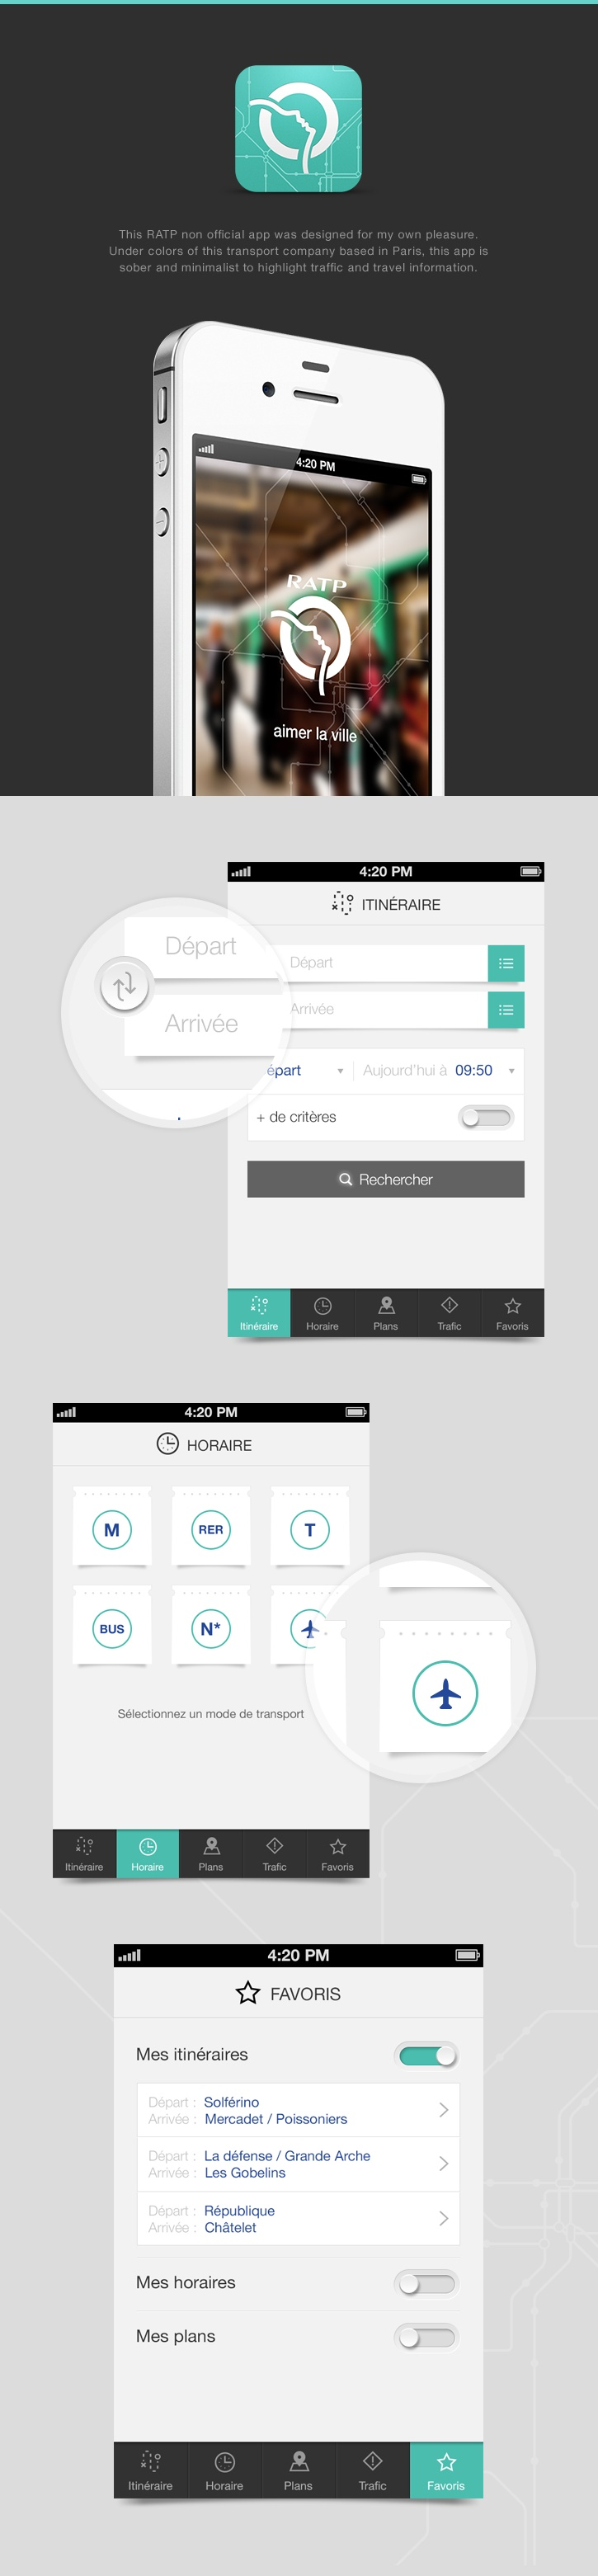 RATP iPhone App by Angelique Calmon, via Behance